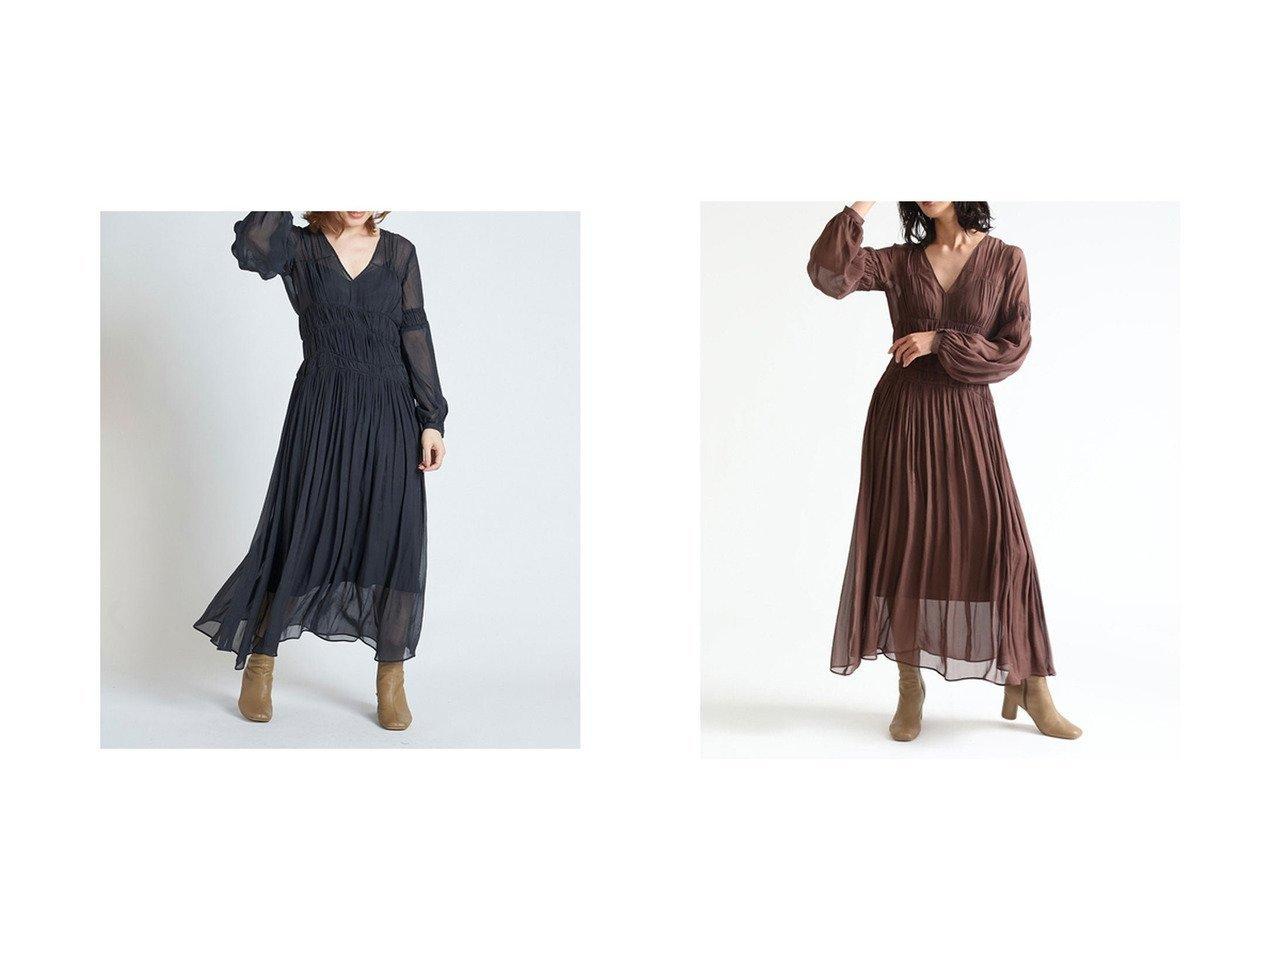 【FRAY I.D/フレイ アイディー】のウエストシャーリングシフォンワンピース ワンピース・ドレスのおすすめ!人気、トレンド・レディースファッションの通販 おすすめで人気の流行・トレンド、ファッションの通販商品 メンズファッション・キッズファッション・インテリア・家具・レディースファッション・服の通販 founy(ファニー) https://founy.com/ ファッション Fashion レディースファッション WOMEN ワンピース Dress アクセサリー インナー キャミソール シアー シフォン シャーリング スマート デコルテ |ID:crp329100000015052